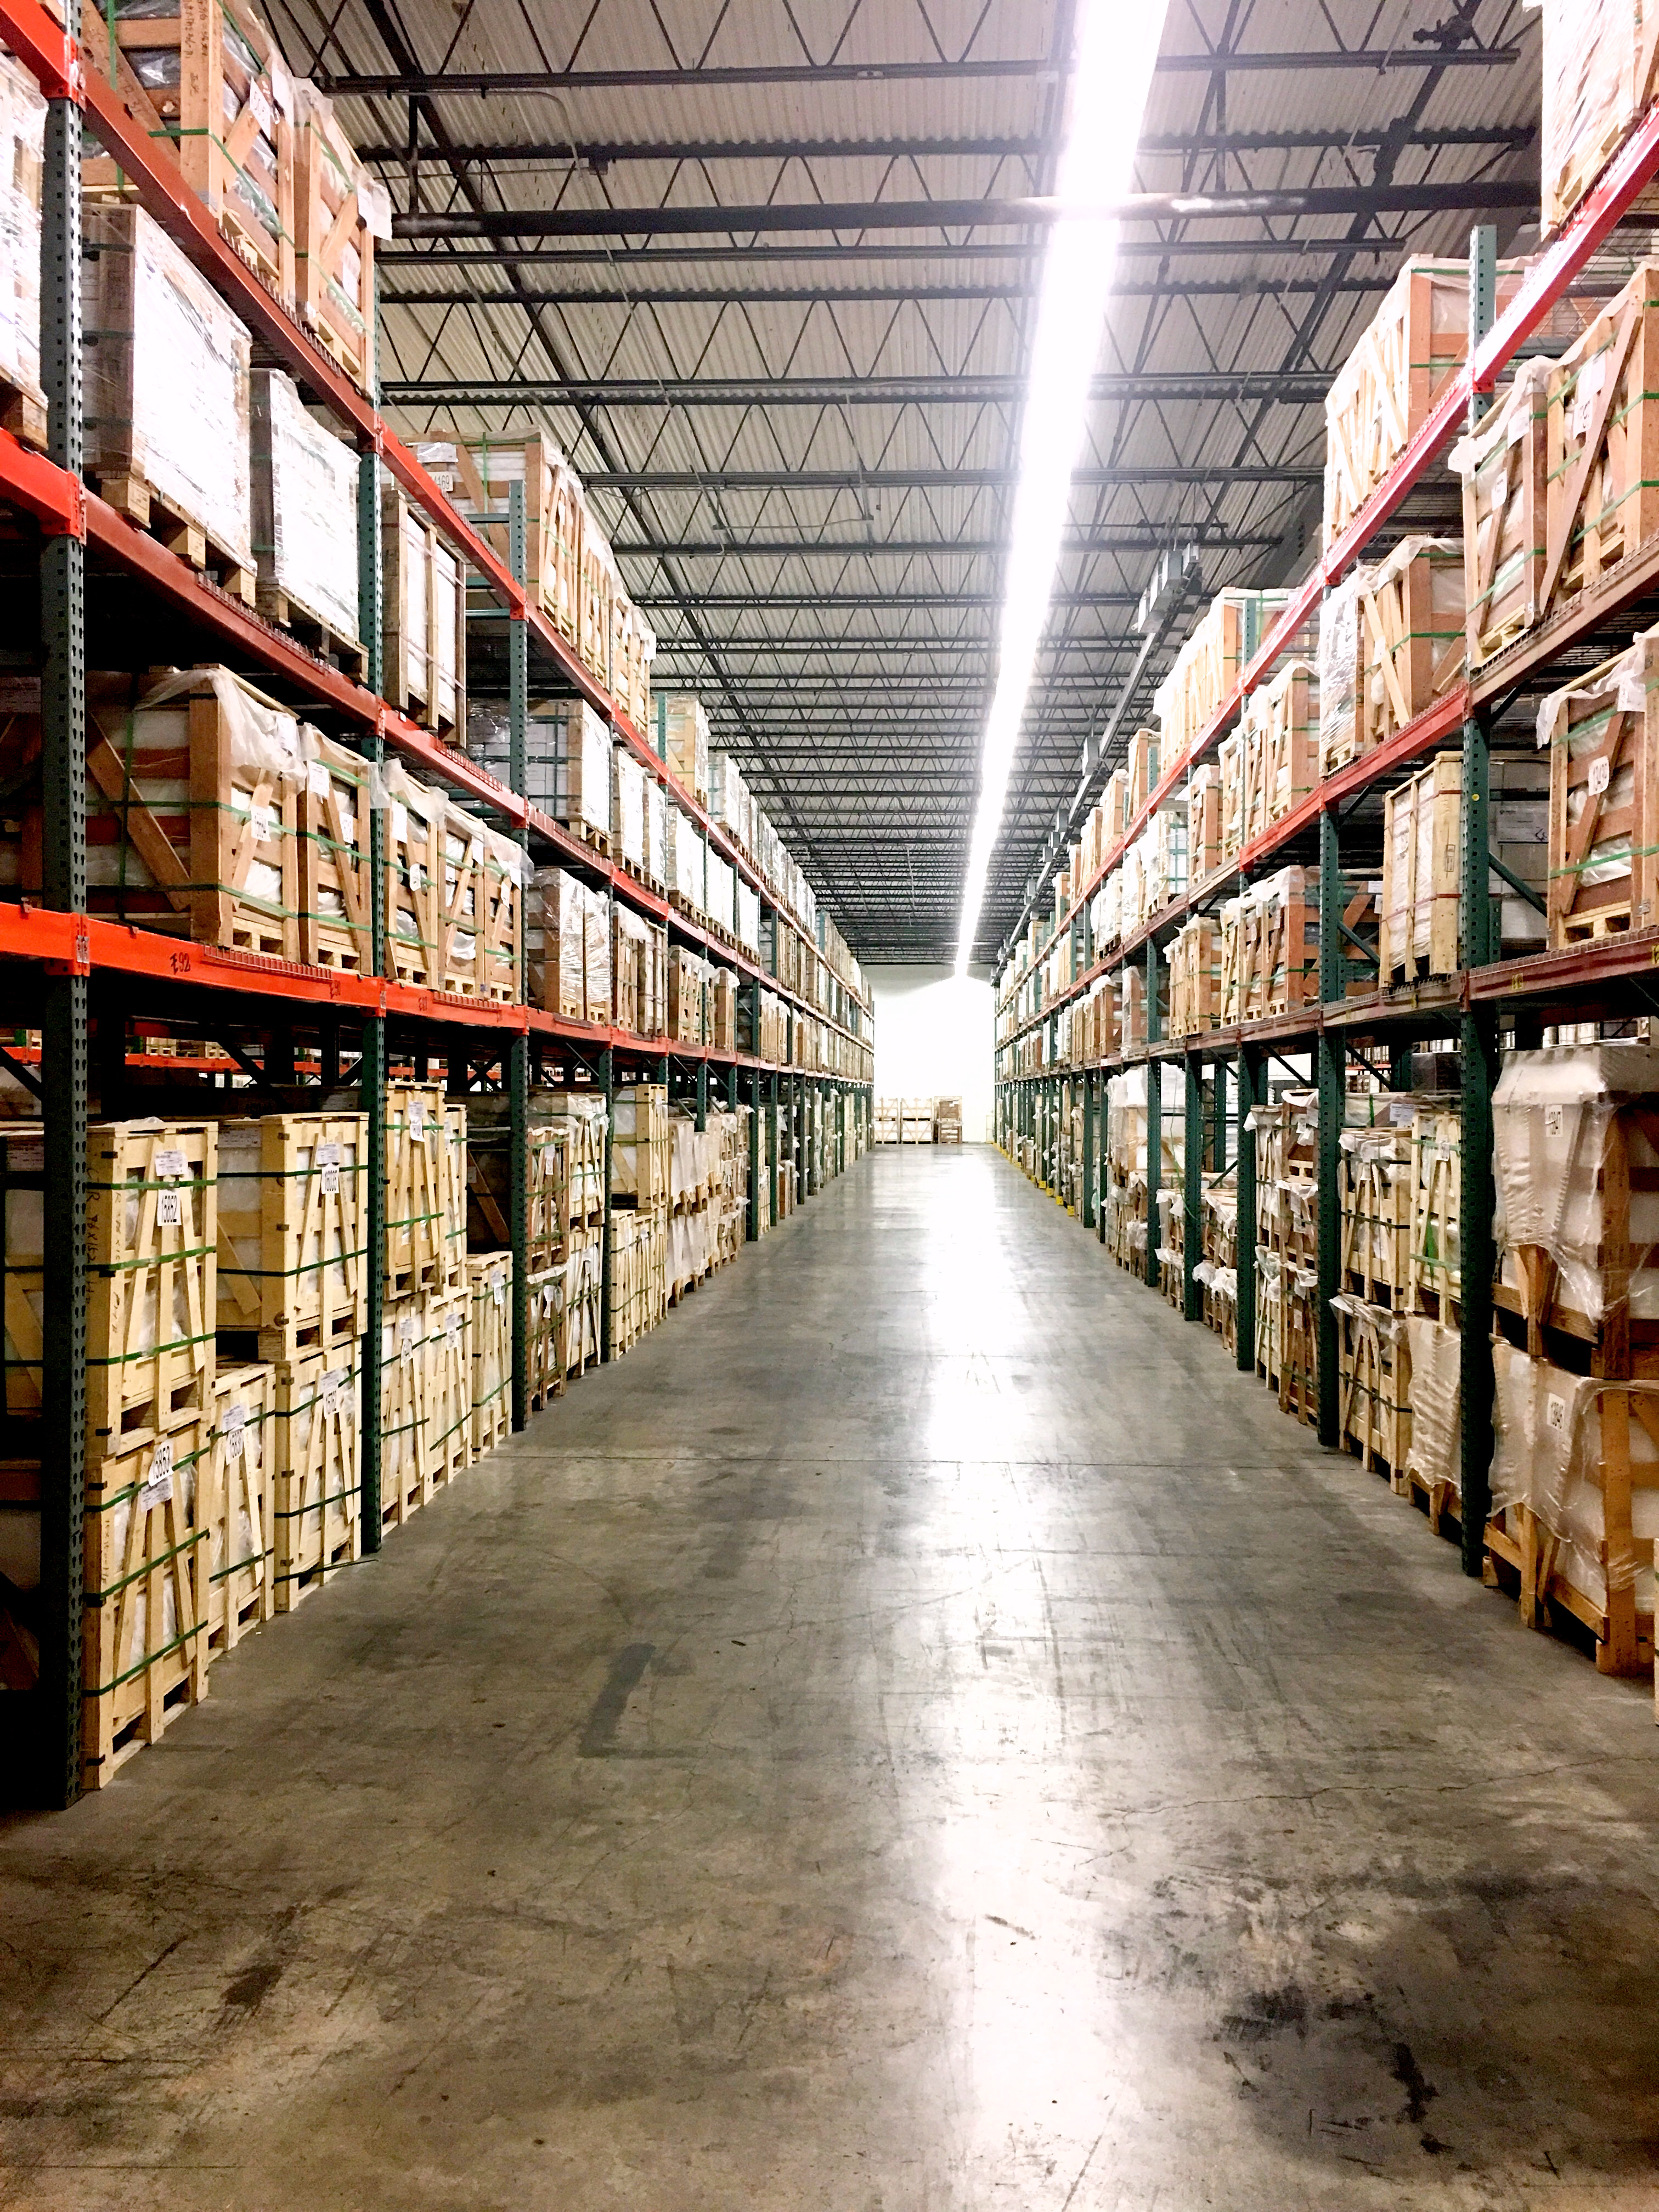 3pl warehouse in Macon, GA